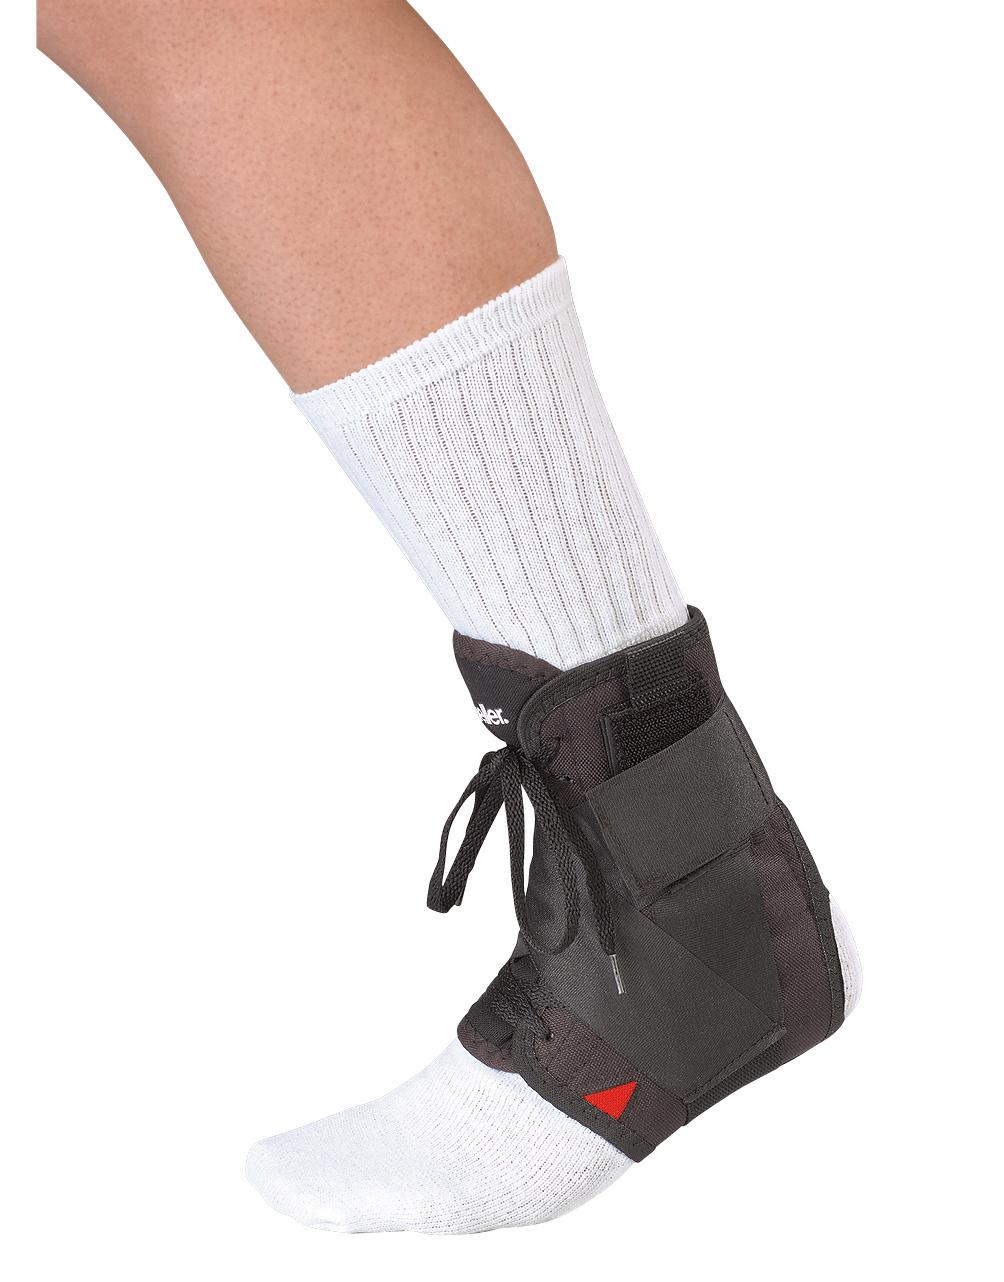 soft-ankle-brace-w-straps-black-xl-213xl-74676213057-lr.jpg